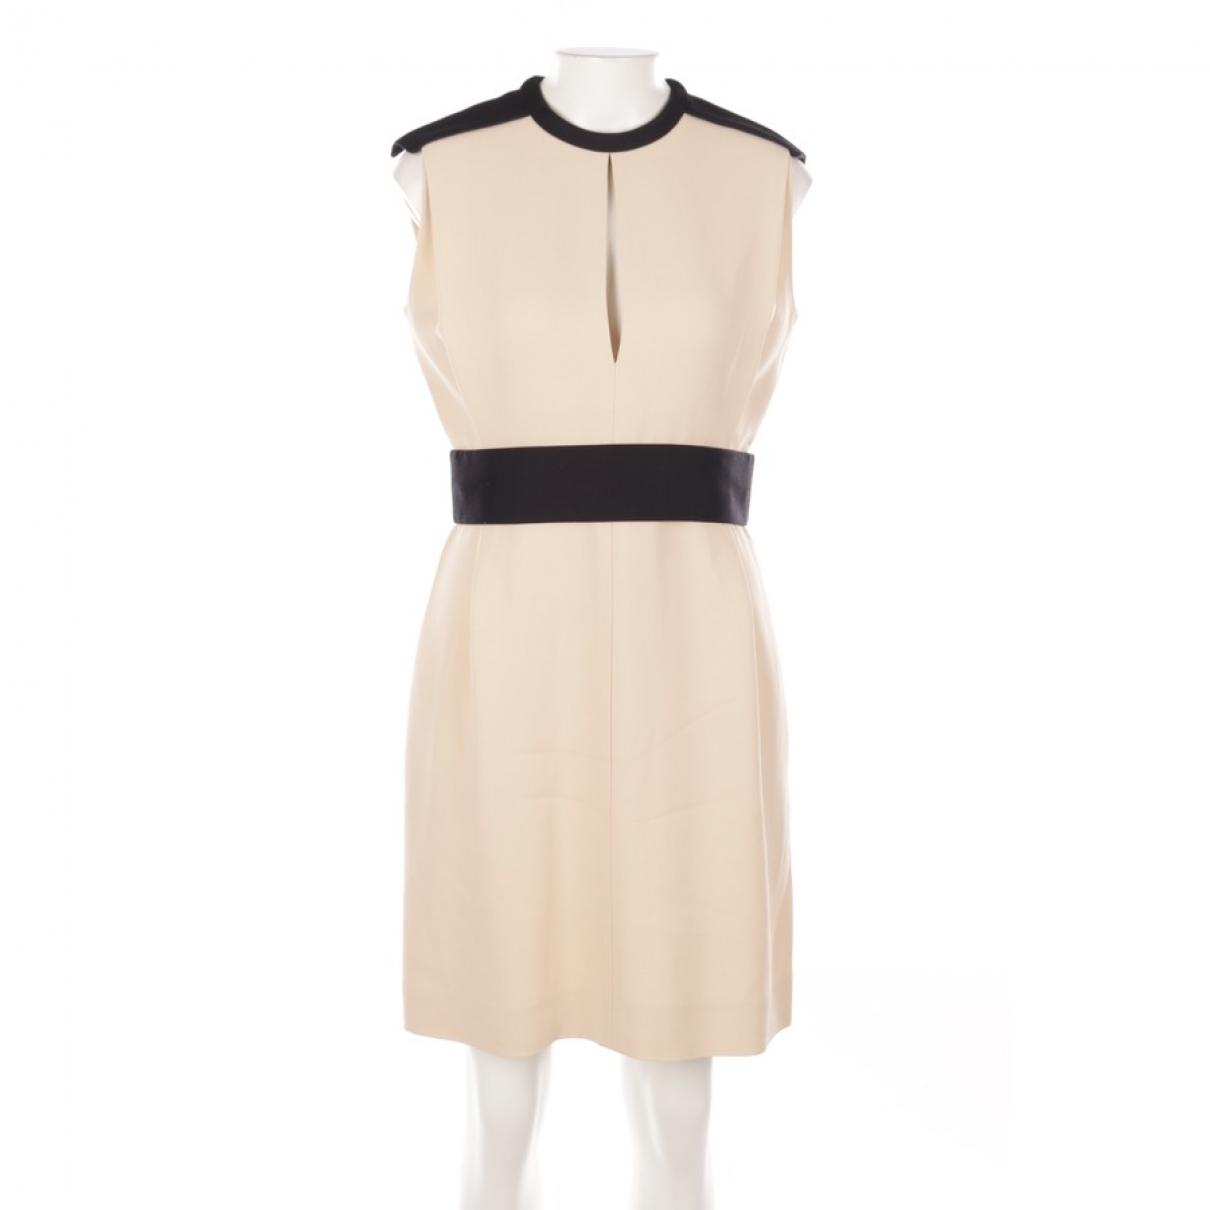 Chloé \N Beige dress for Women 38 FR